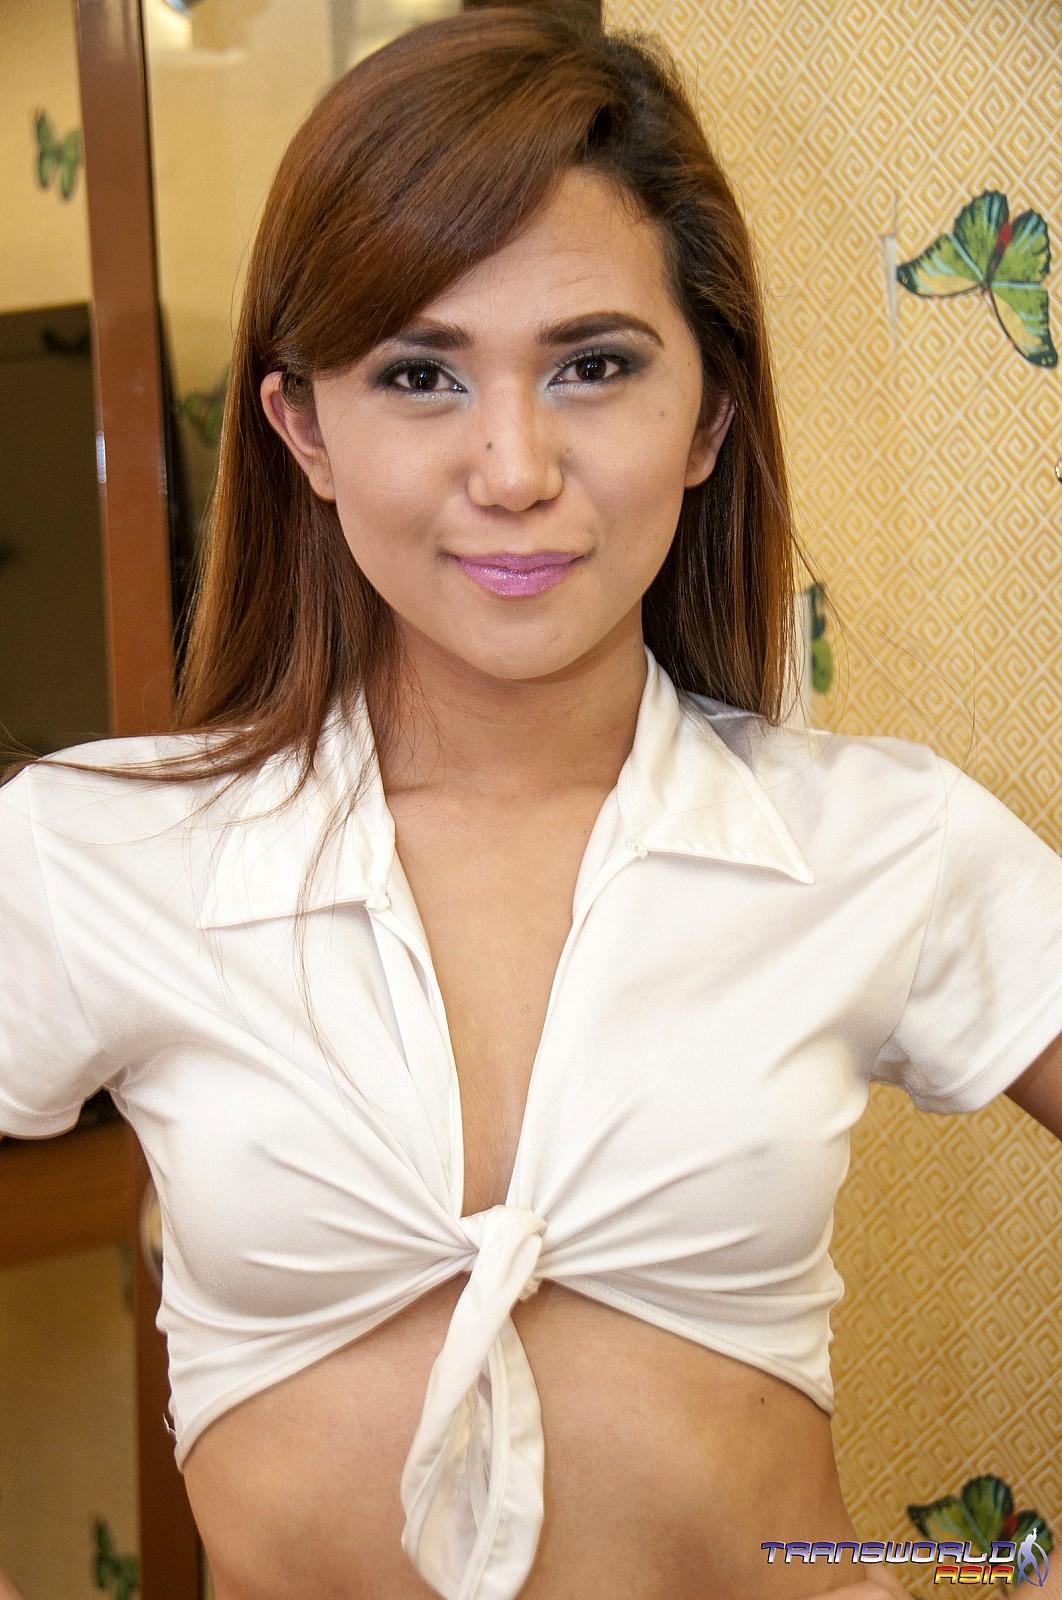 Thai School-Girl TGirl Has A Really Massive She Tool